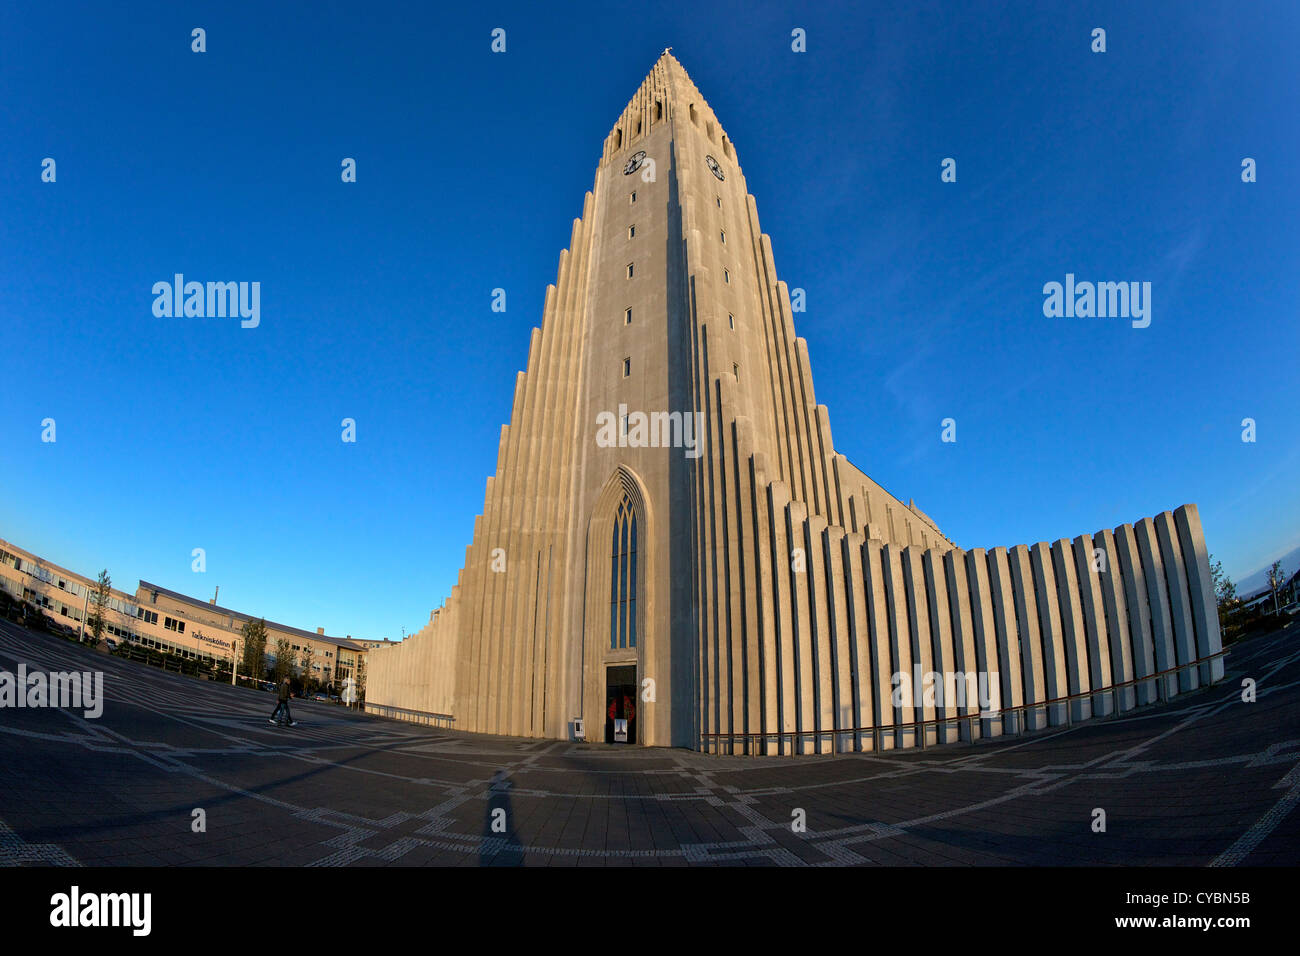 La Iglesia Hallgrimskirkja o Catedral al atardecer, Reykjavik, Iceland Foto de stock